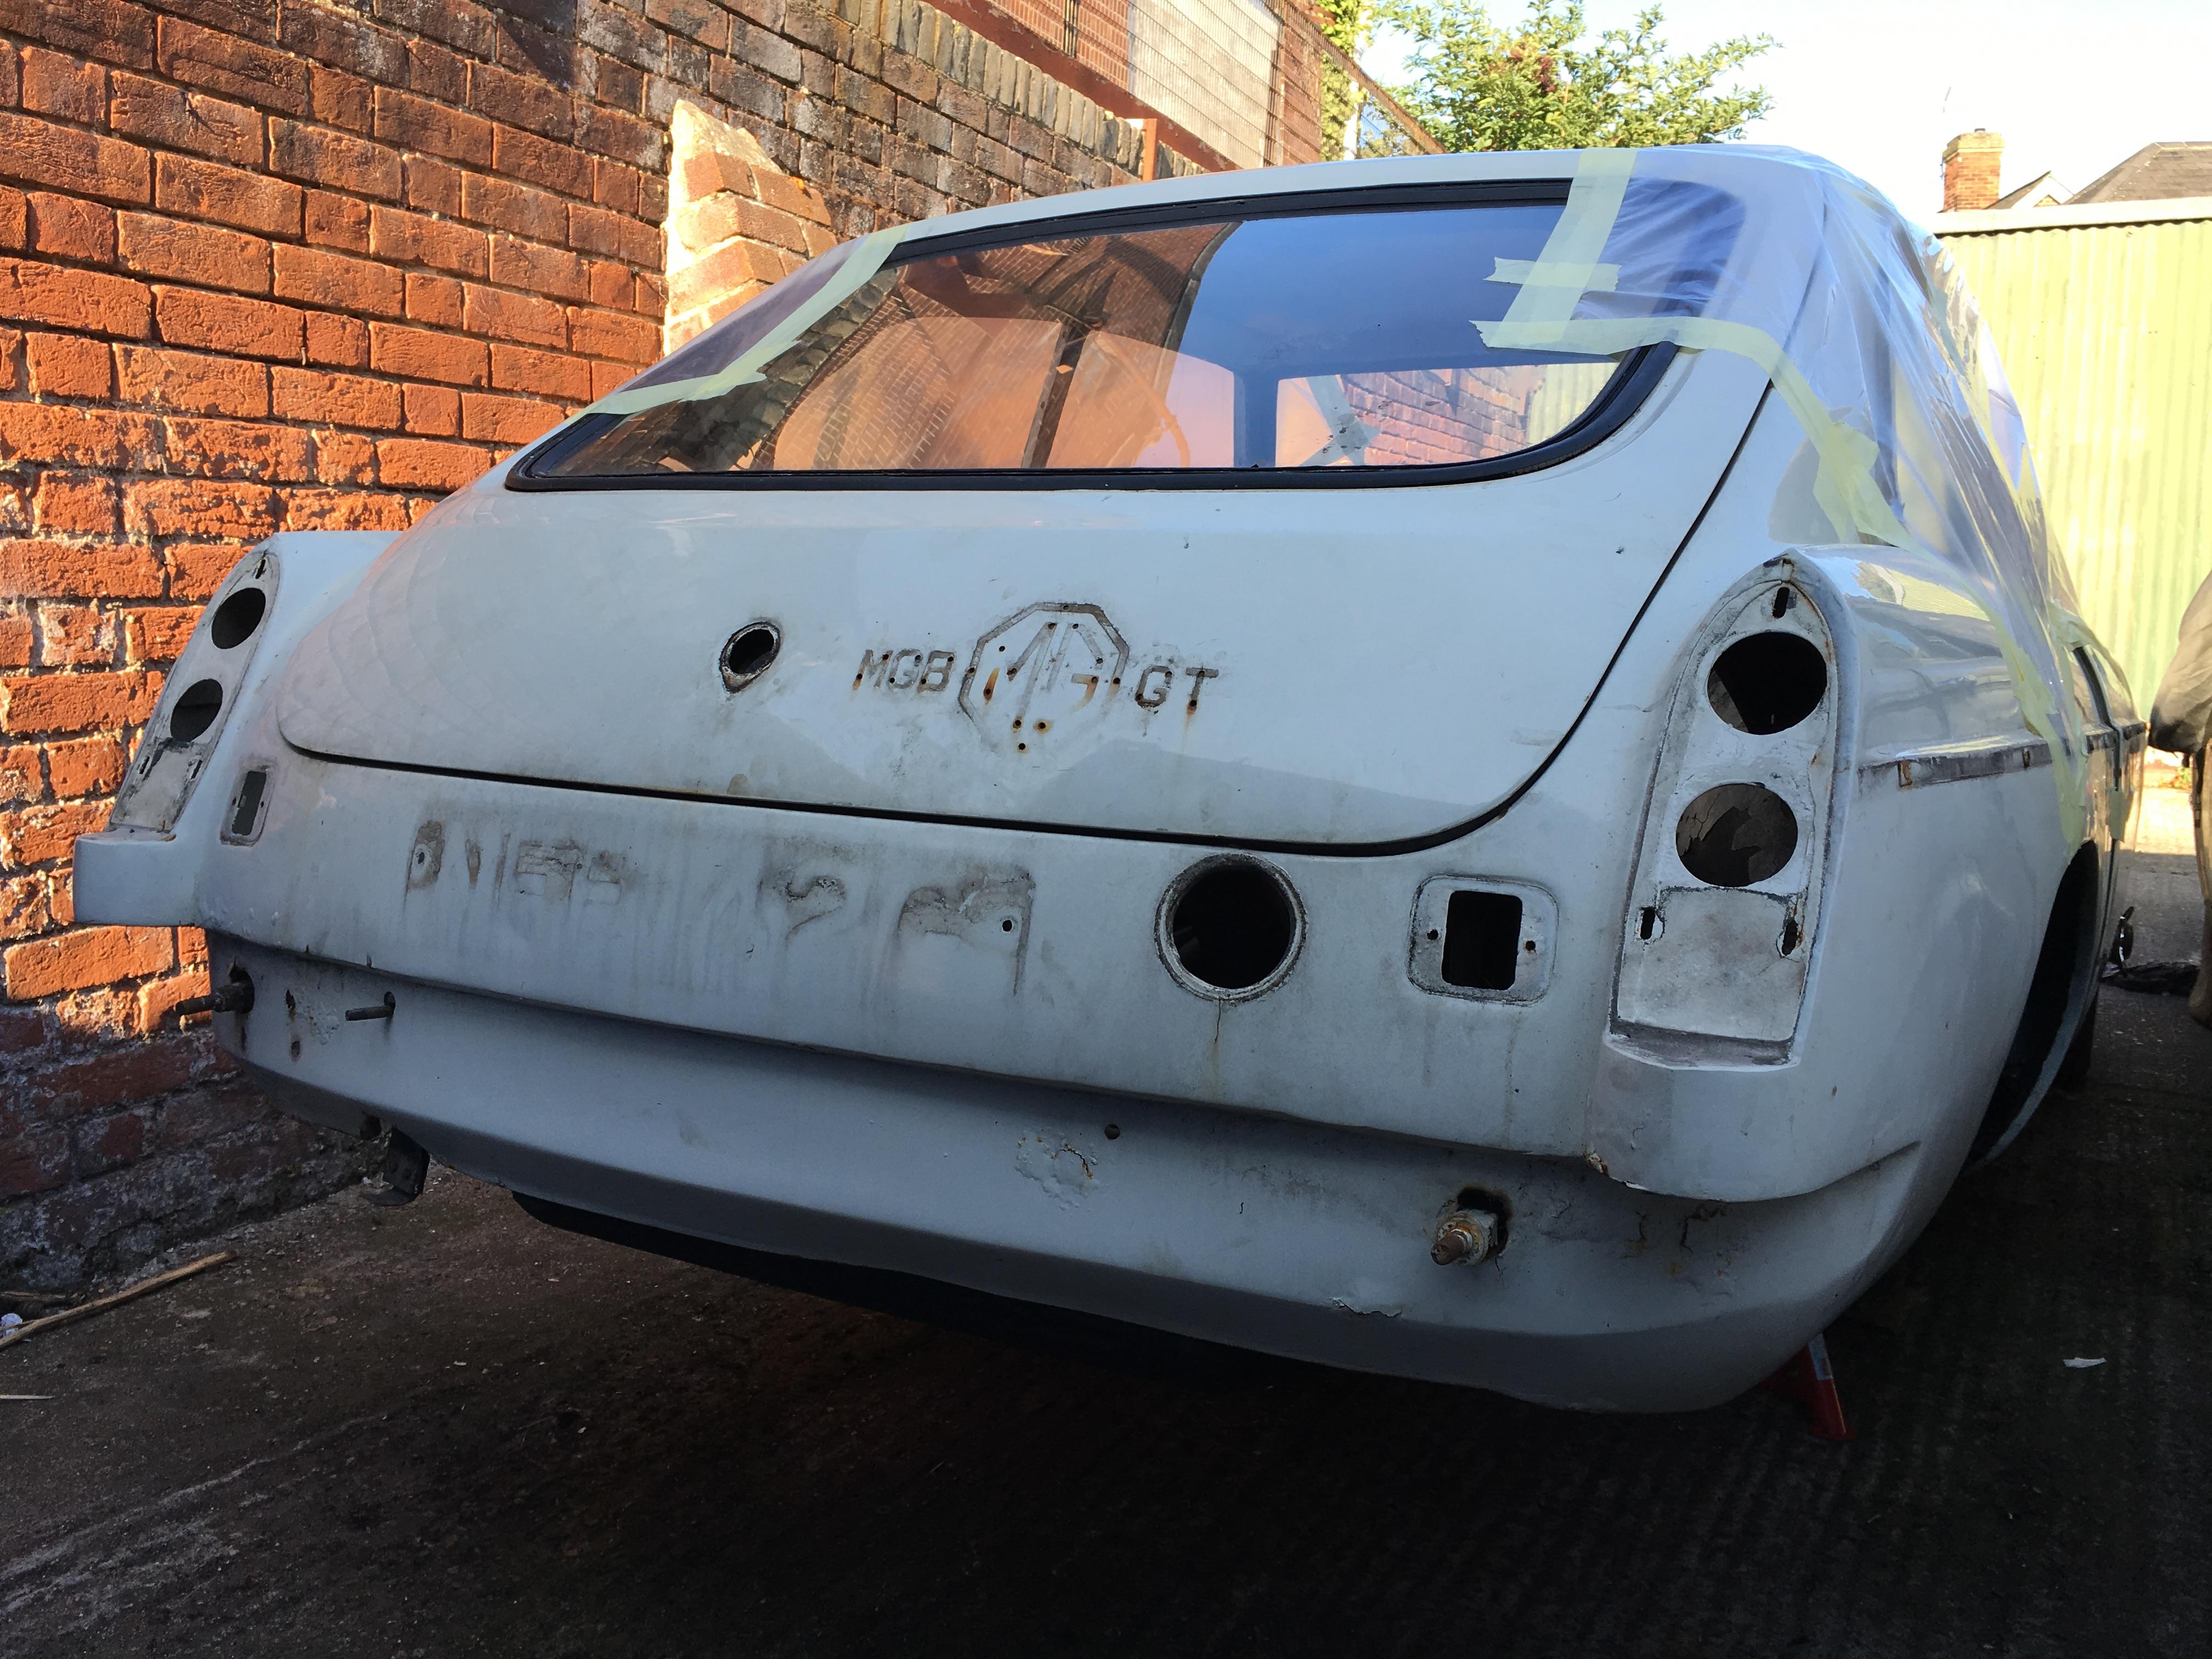 MGBGT Stripped at Bridge Classic Cars